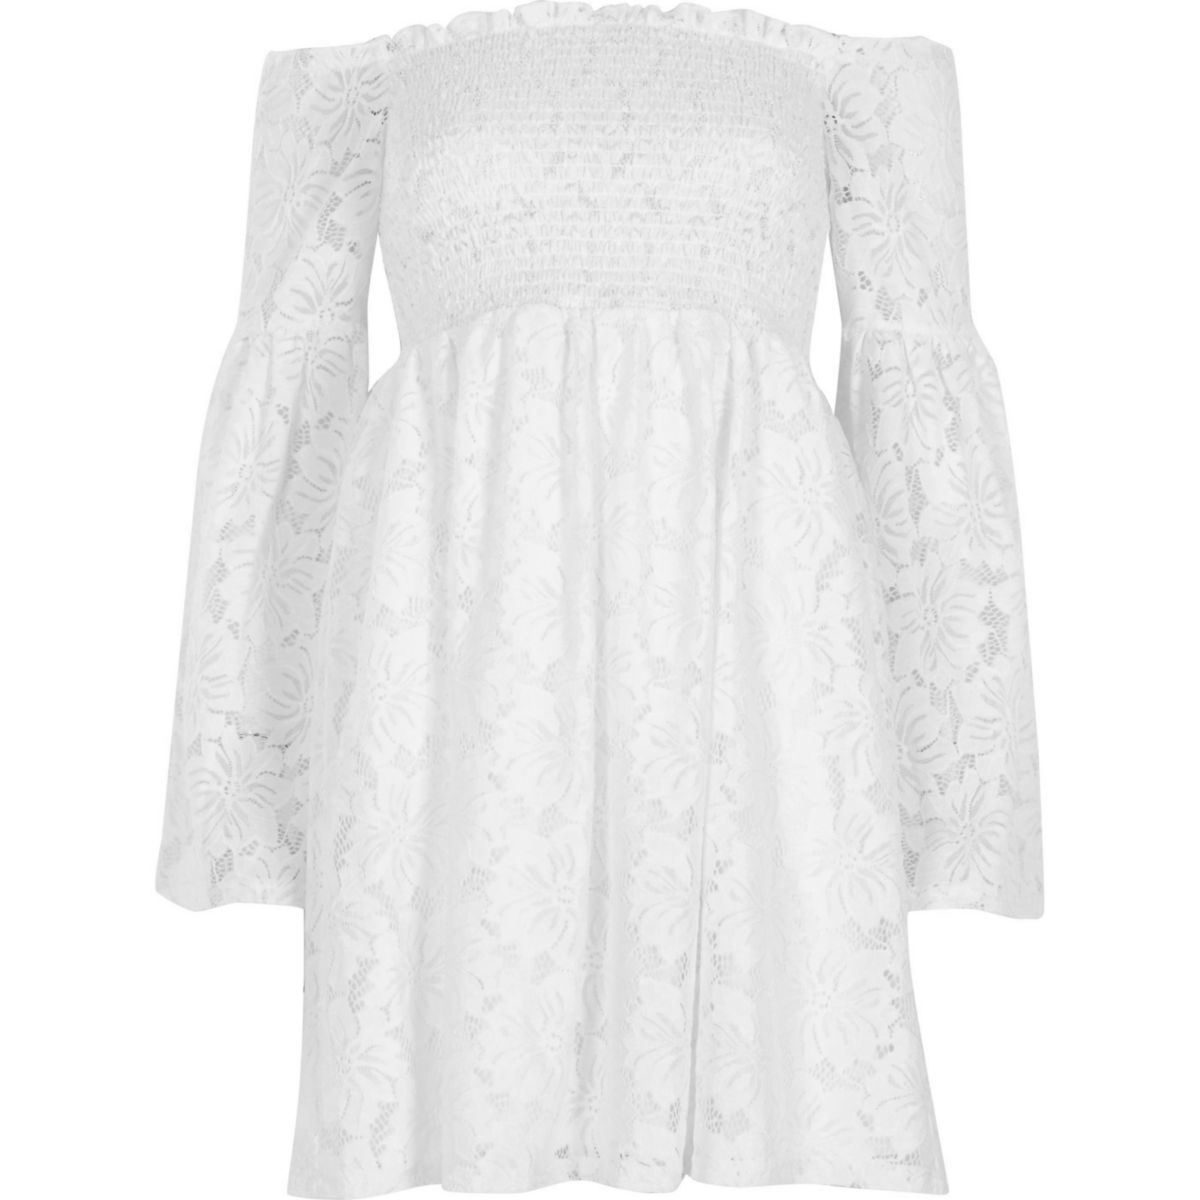 White lace shirred bardot bell sleeve dress